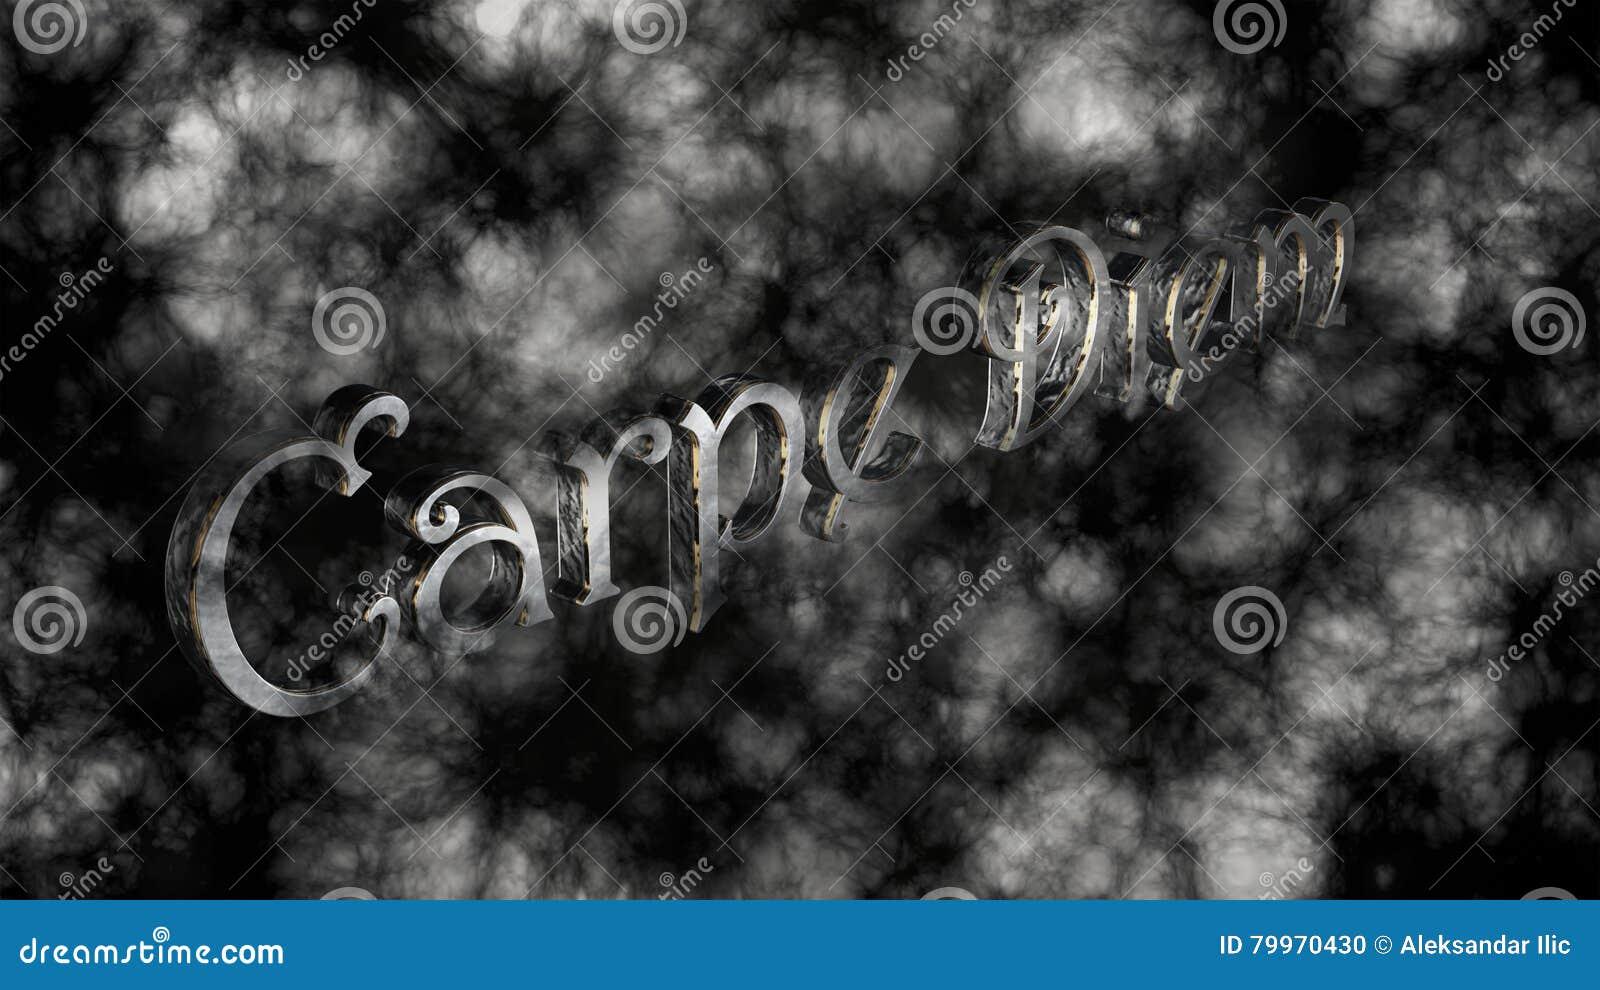 74a6a1bab242 Carpe Diem - η λατινική φράση που σημαίνει συλλαμβάνει τη στιγμή ...